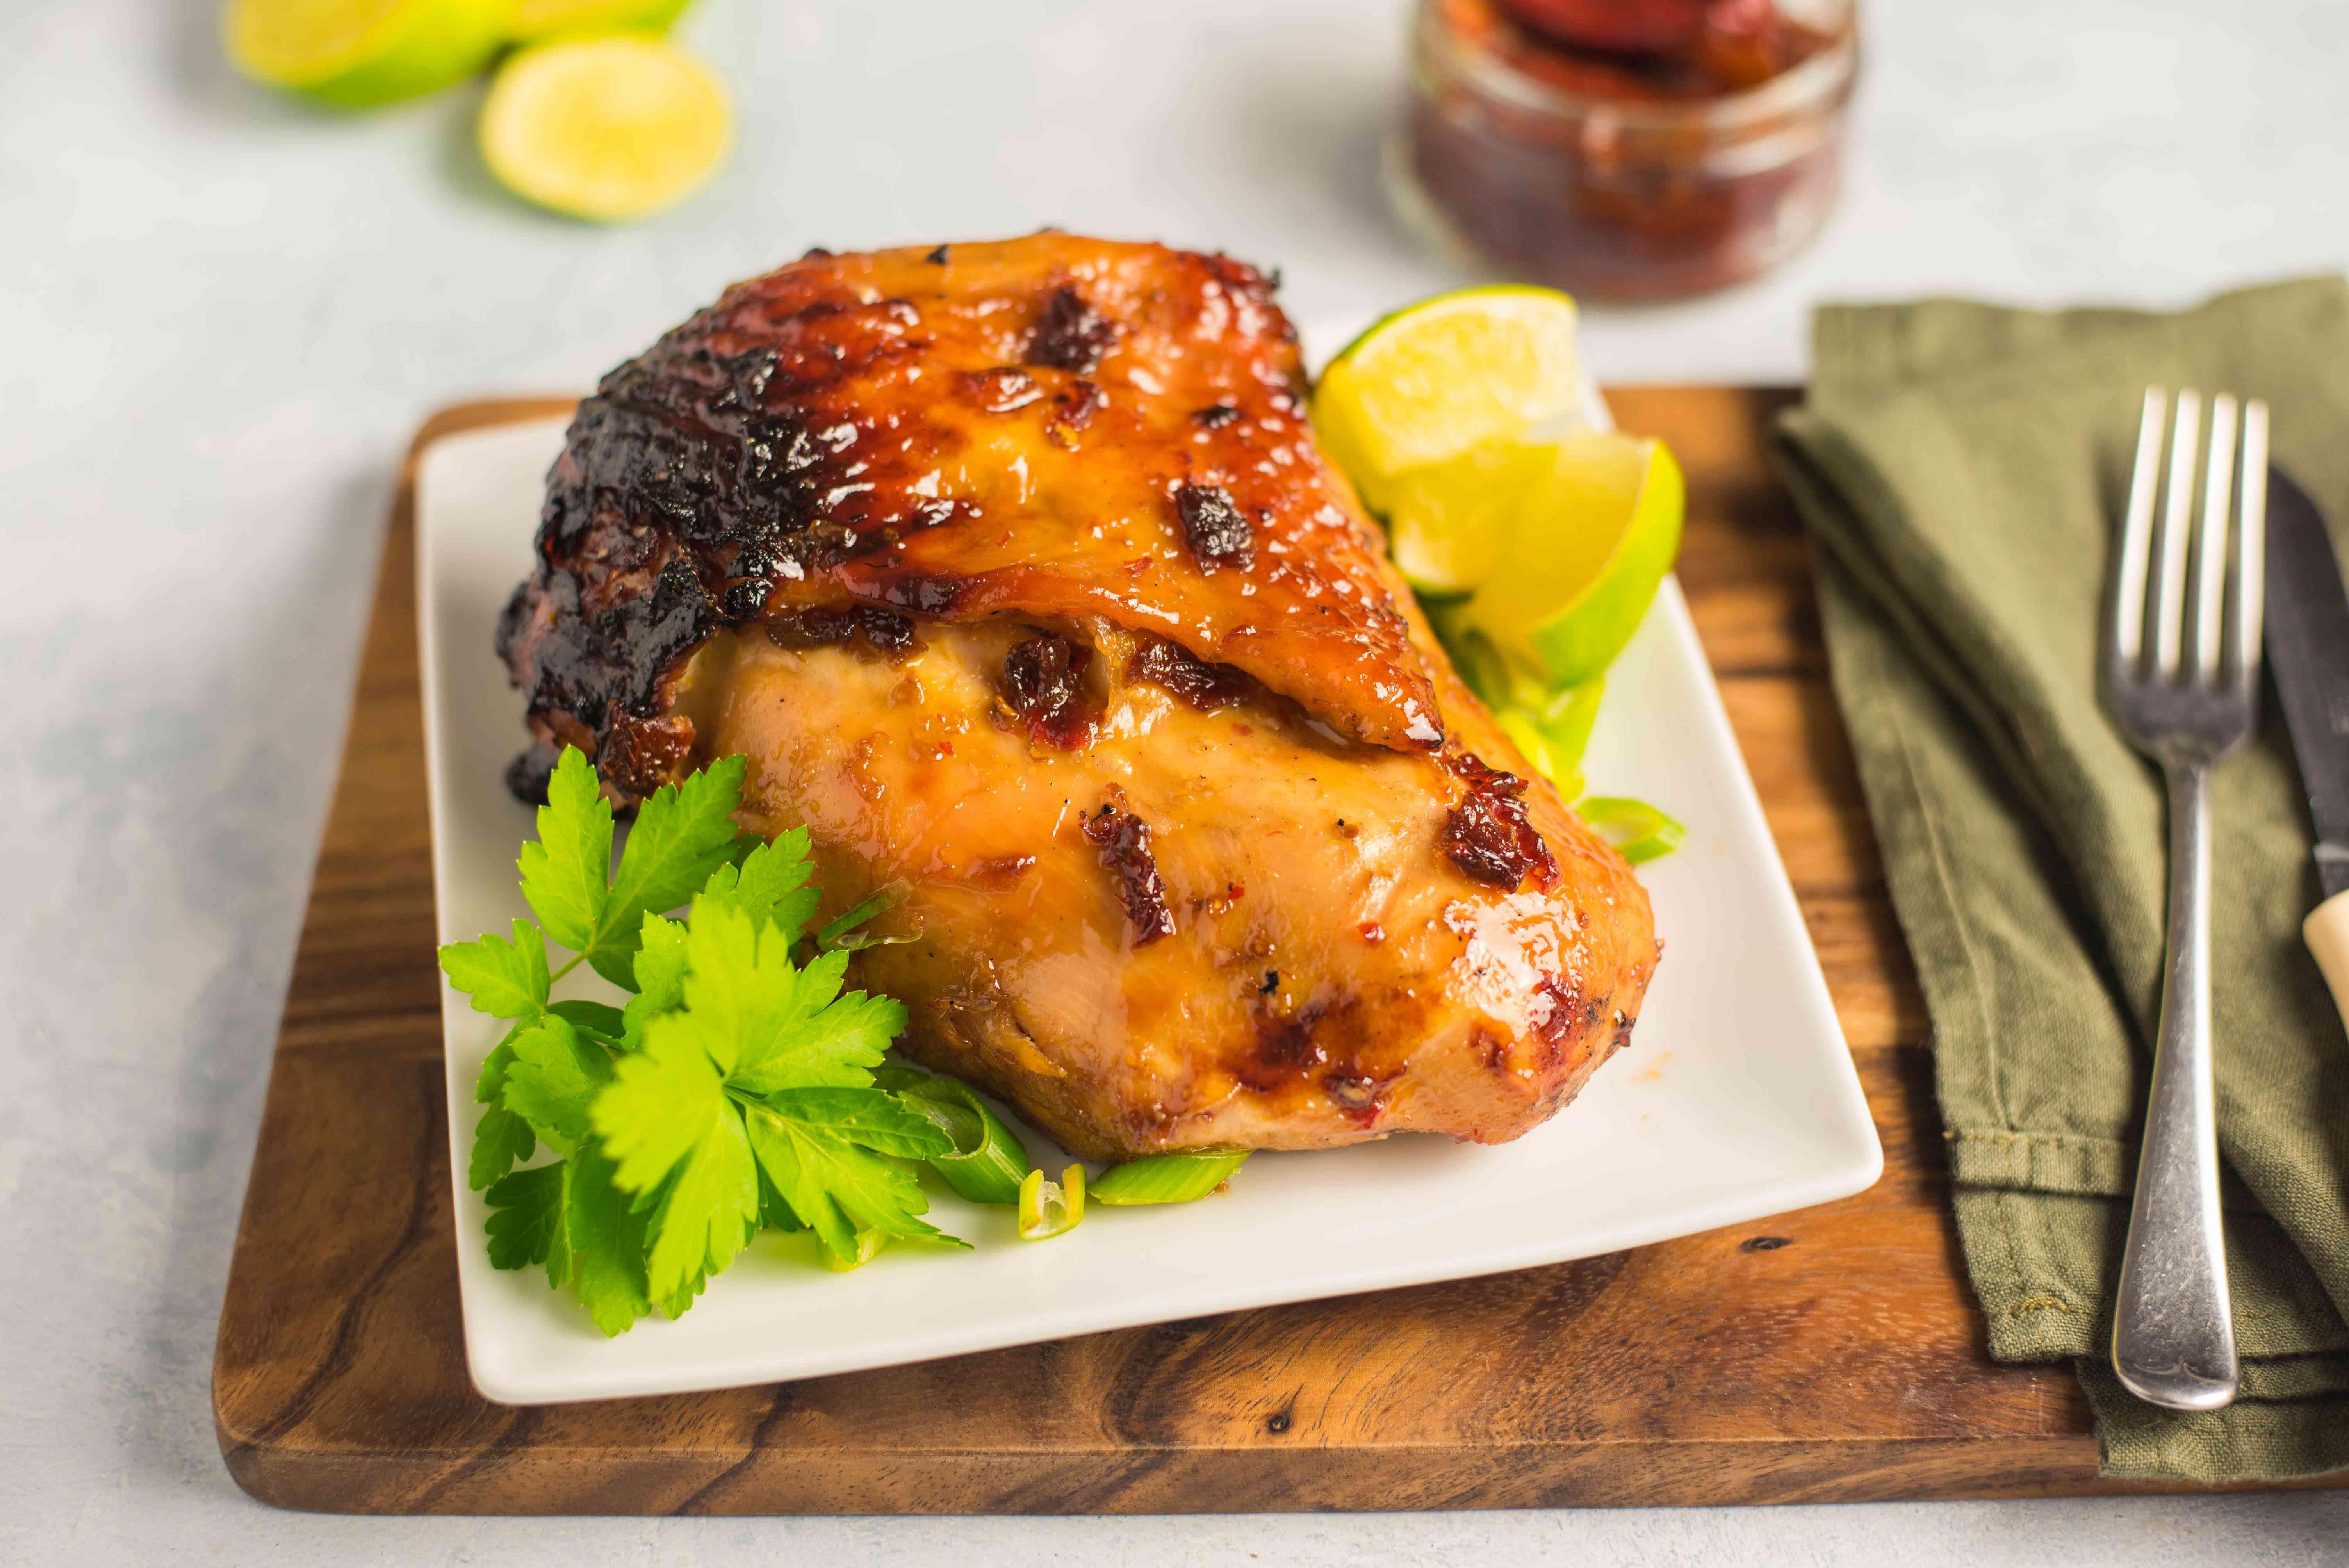 Chipotle chicken breast